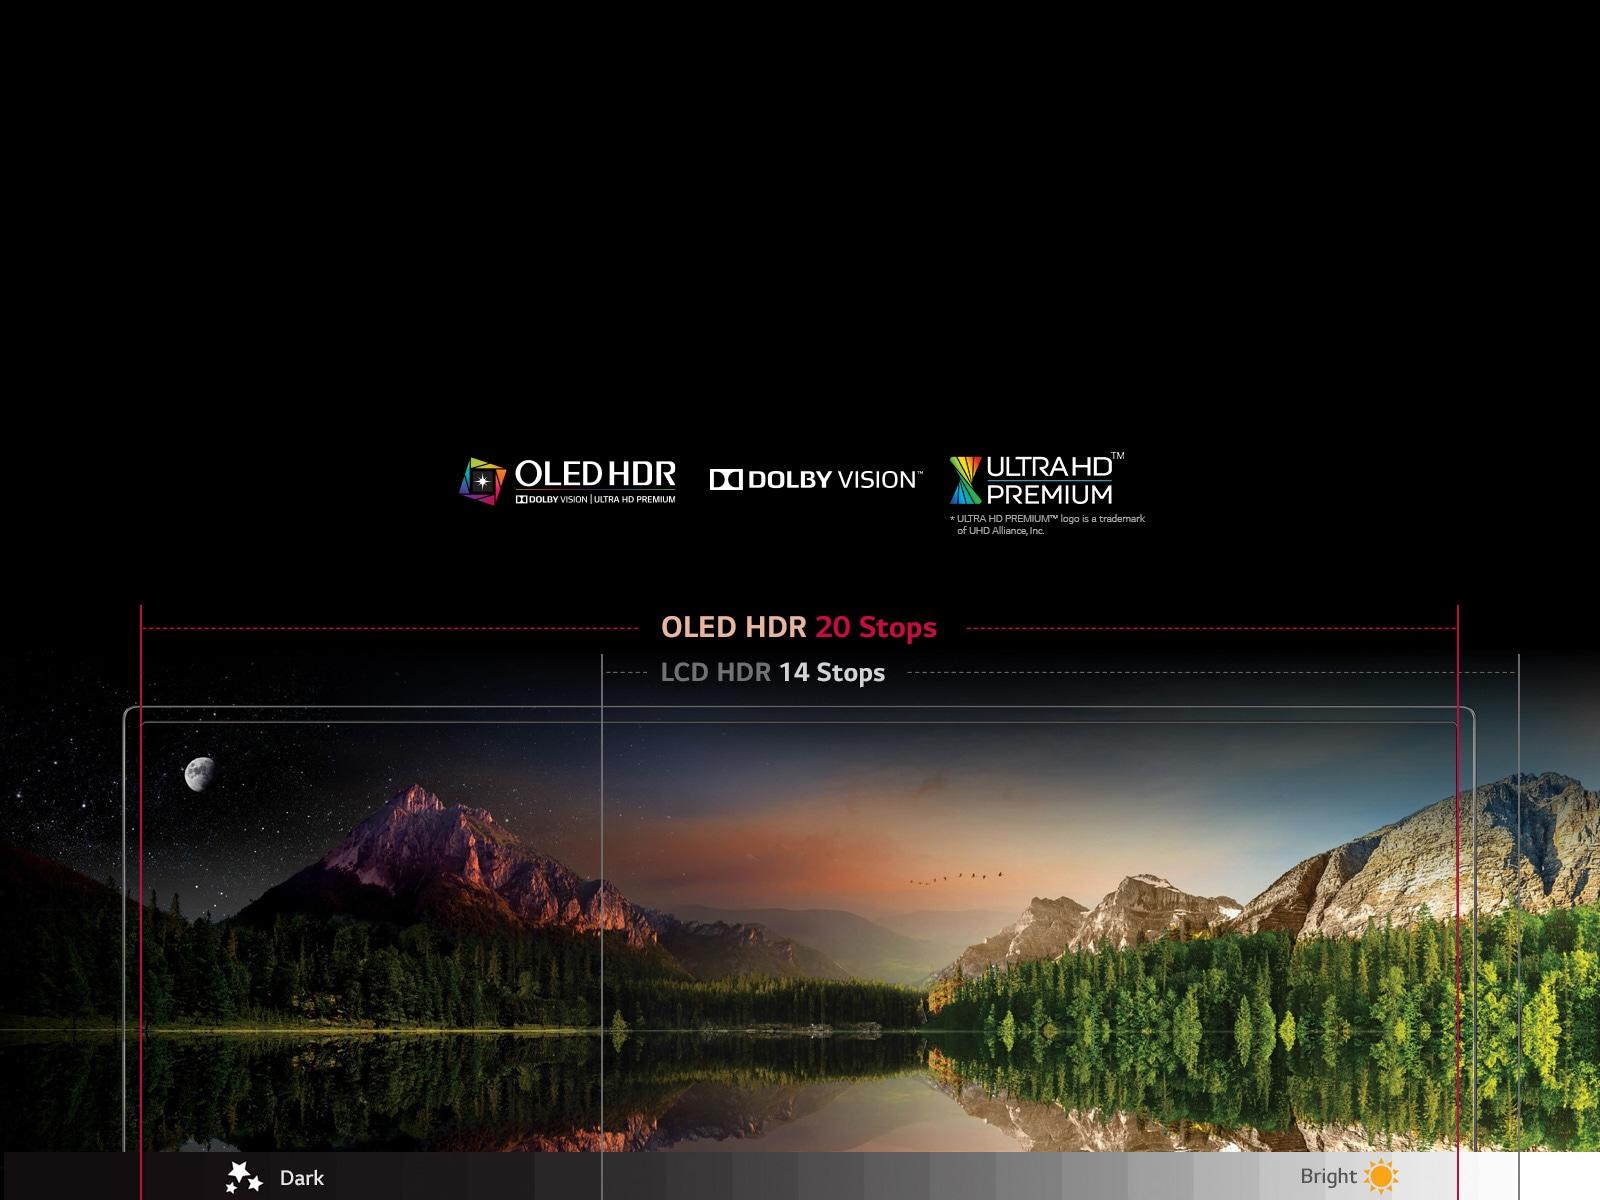 LG OLED TV ดึงประสิทธิภาพ HDR ได้สูงที่สุดด้วยการแสดงสีดำได้ดำสนิท